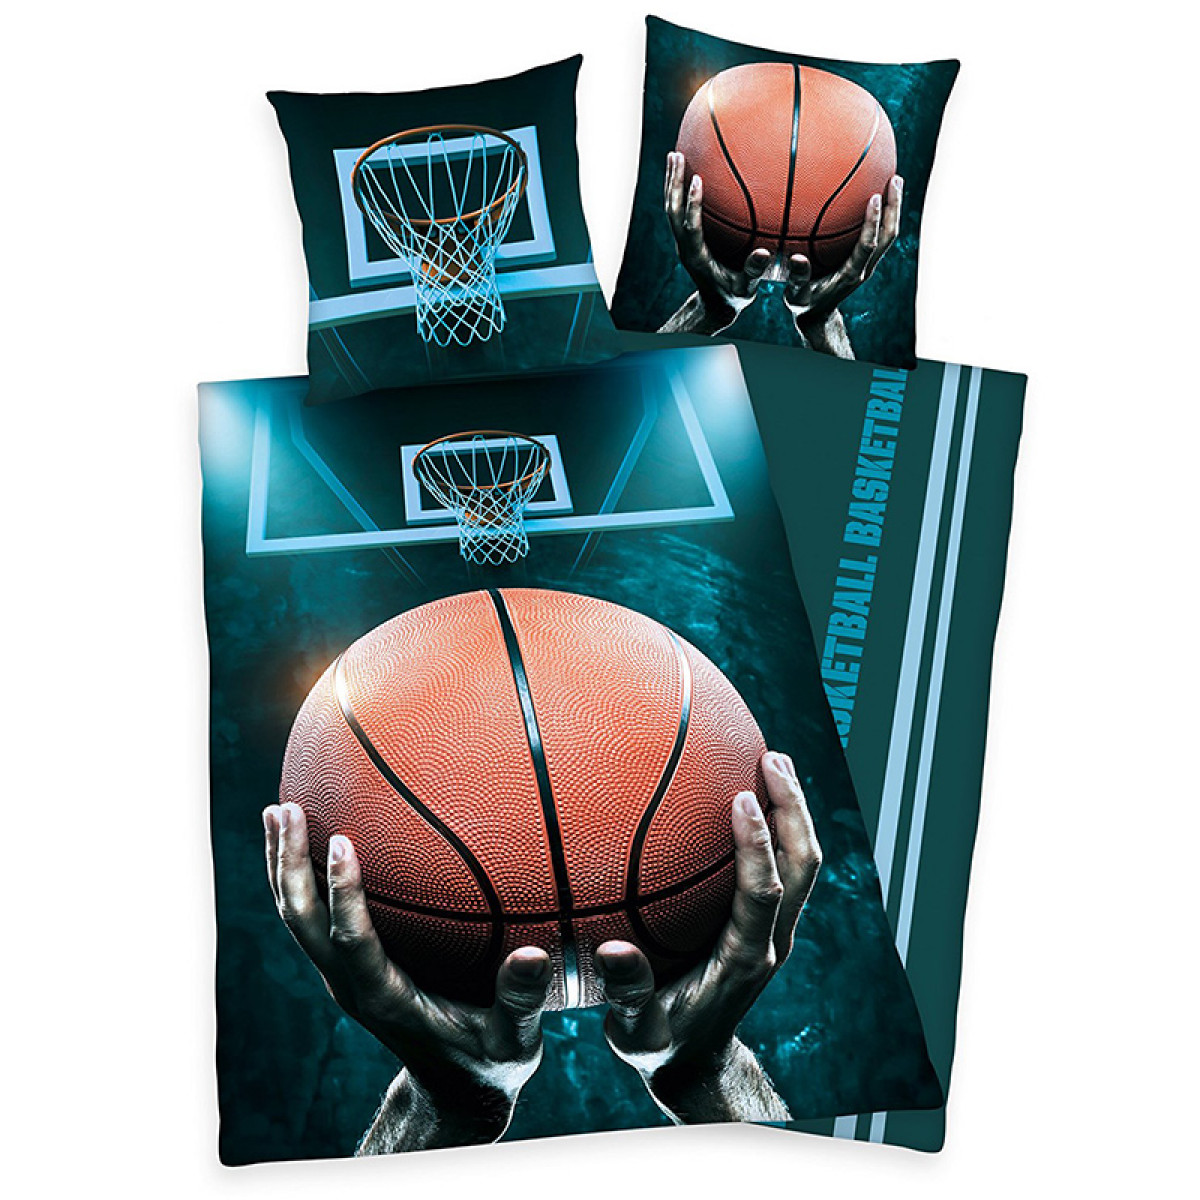 Basketball Single Duvet Cover And Pillowcase Set Bedding